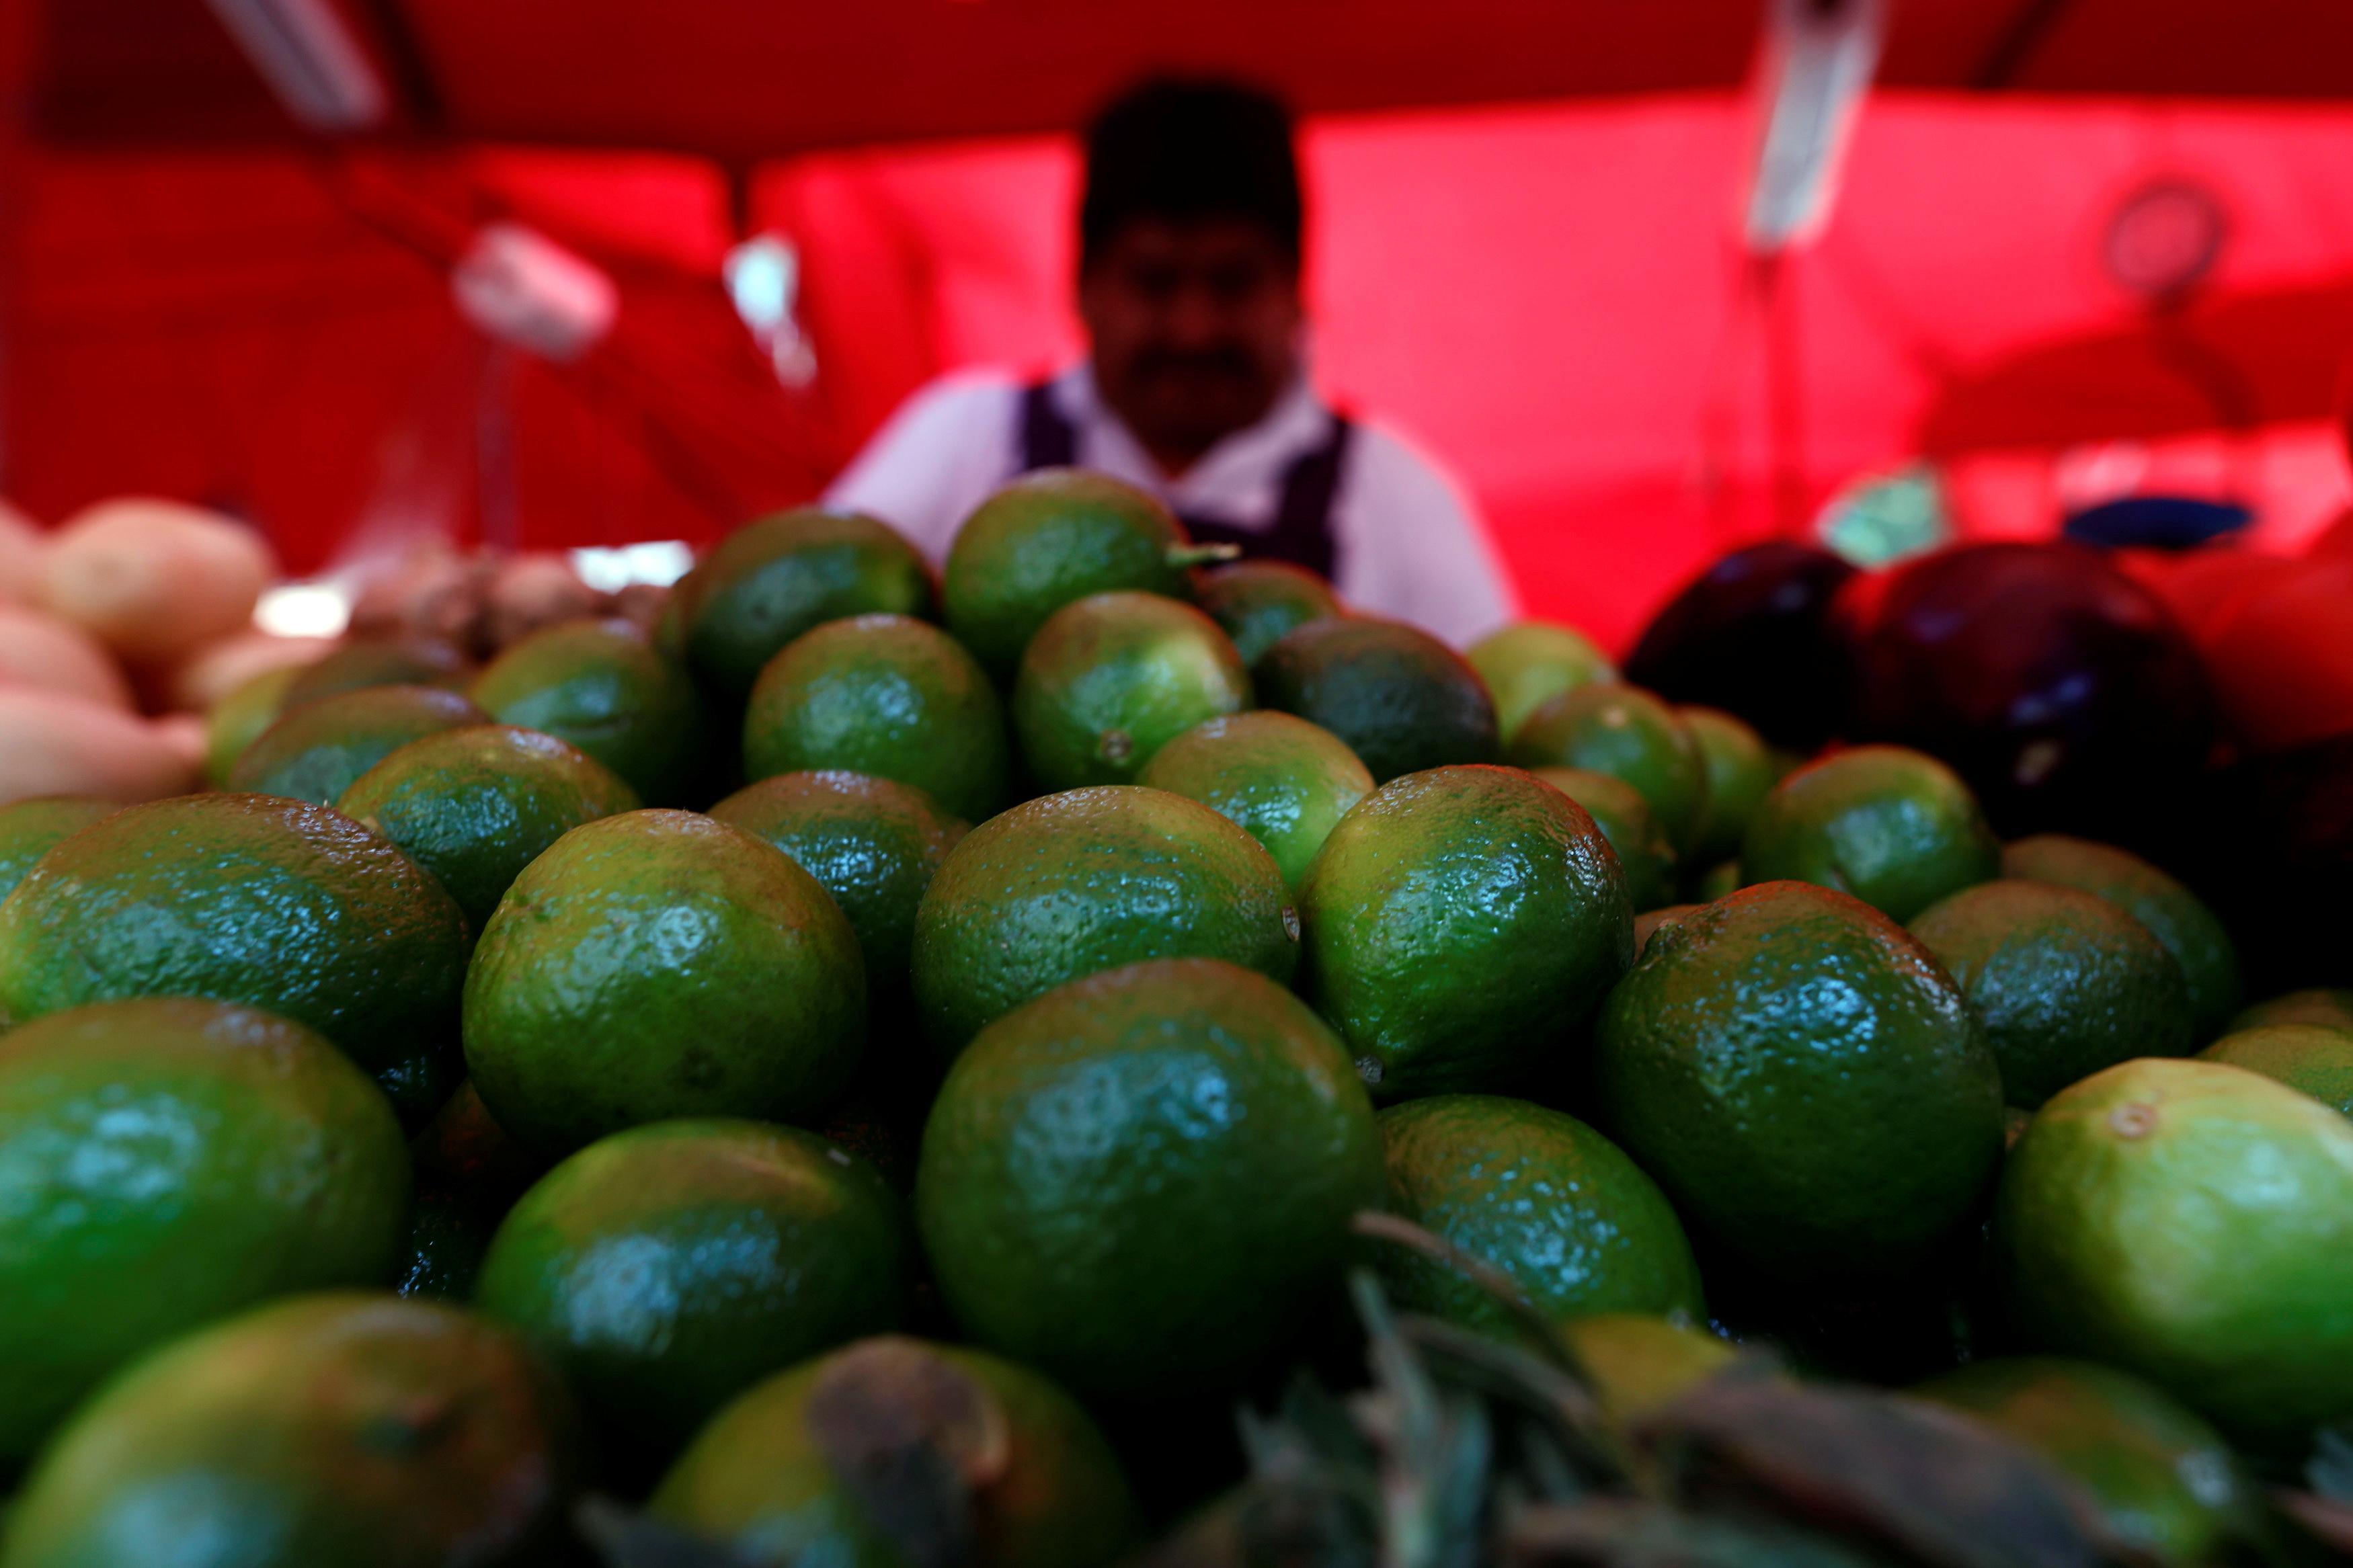 Avocado shortages, virgin margaritas: Border shutdown would hit